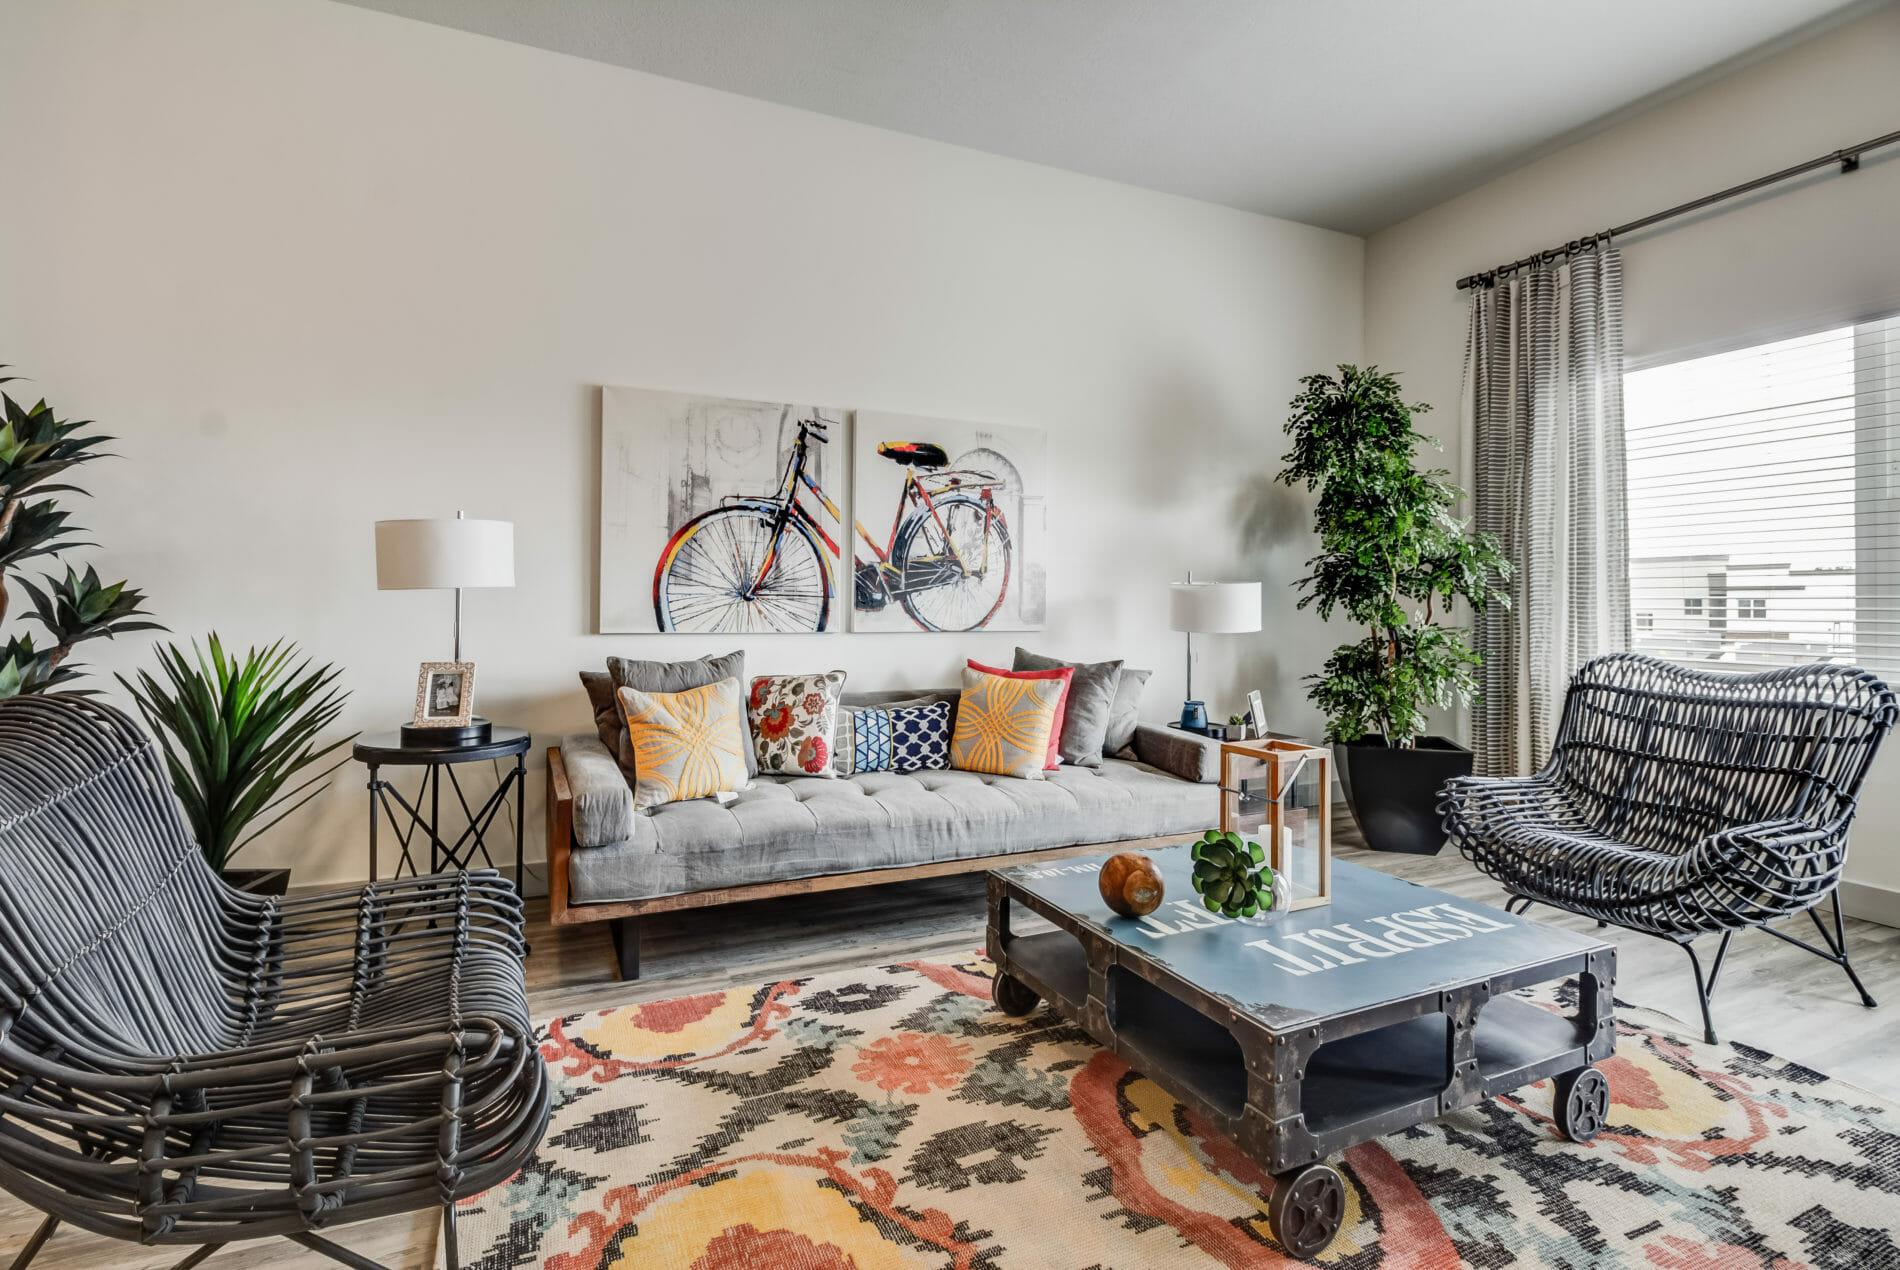 Professional Interior Design Tricks For Decorating Small Spaces